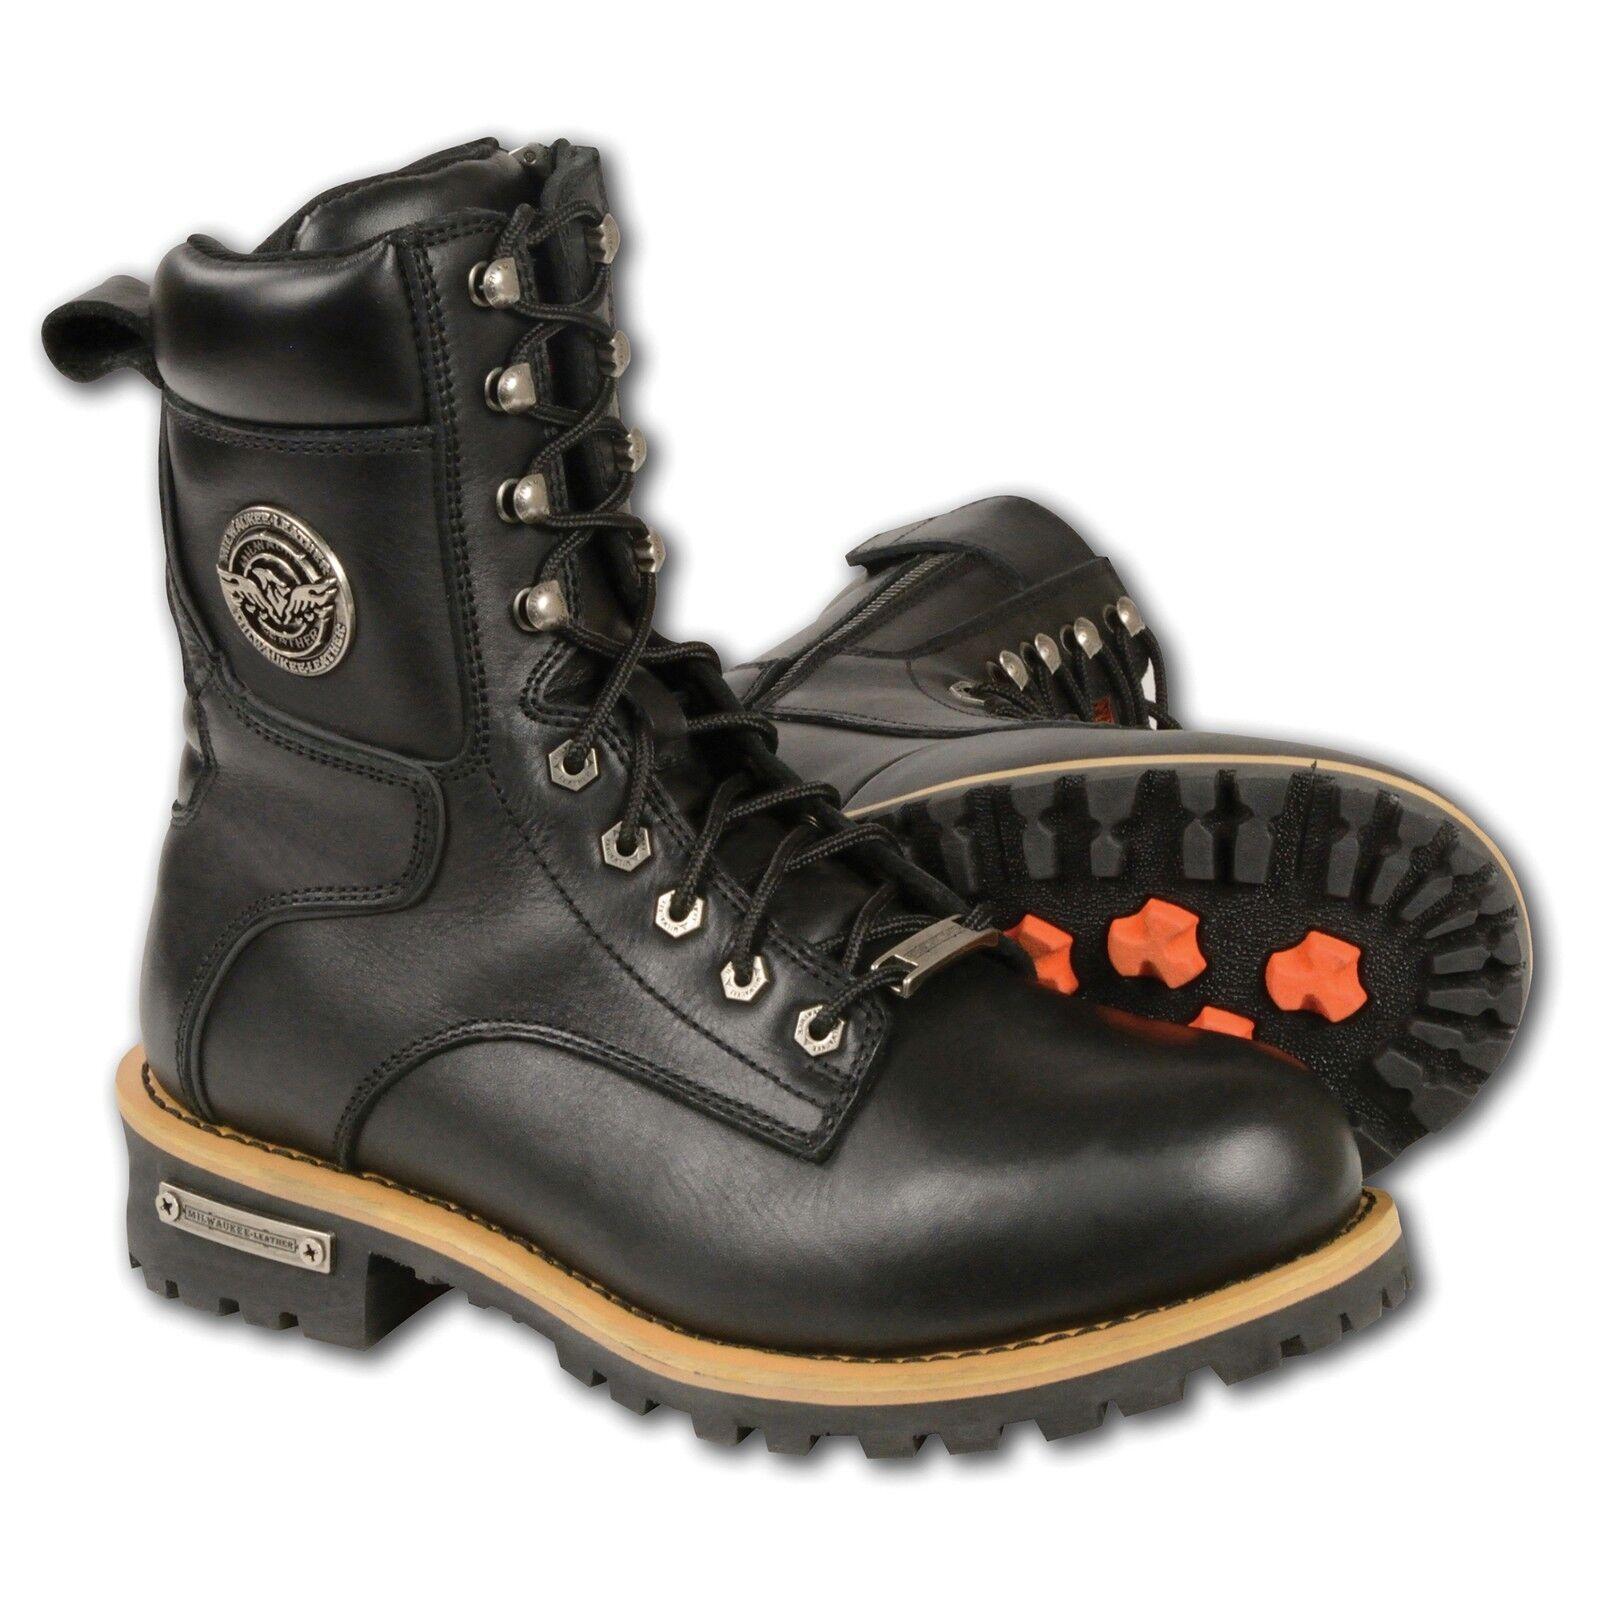 Milwaukee Leather  Men's Lace To Toe Biker Boots w  Side Zipper ClosureMBM9095W